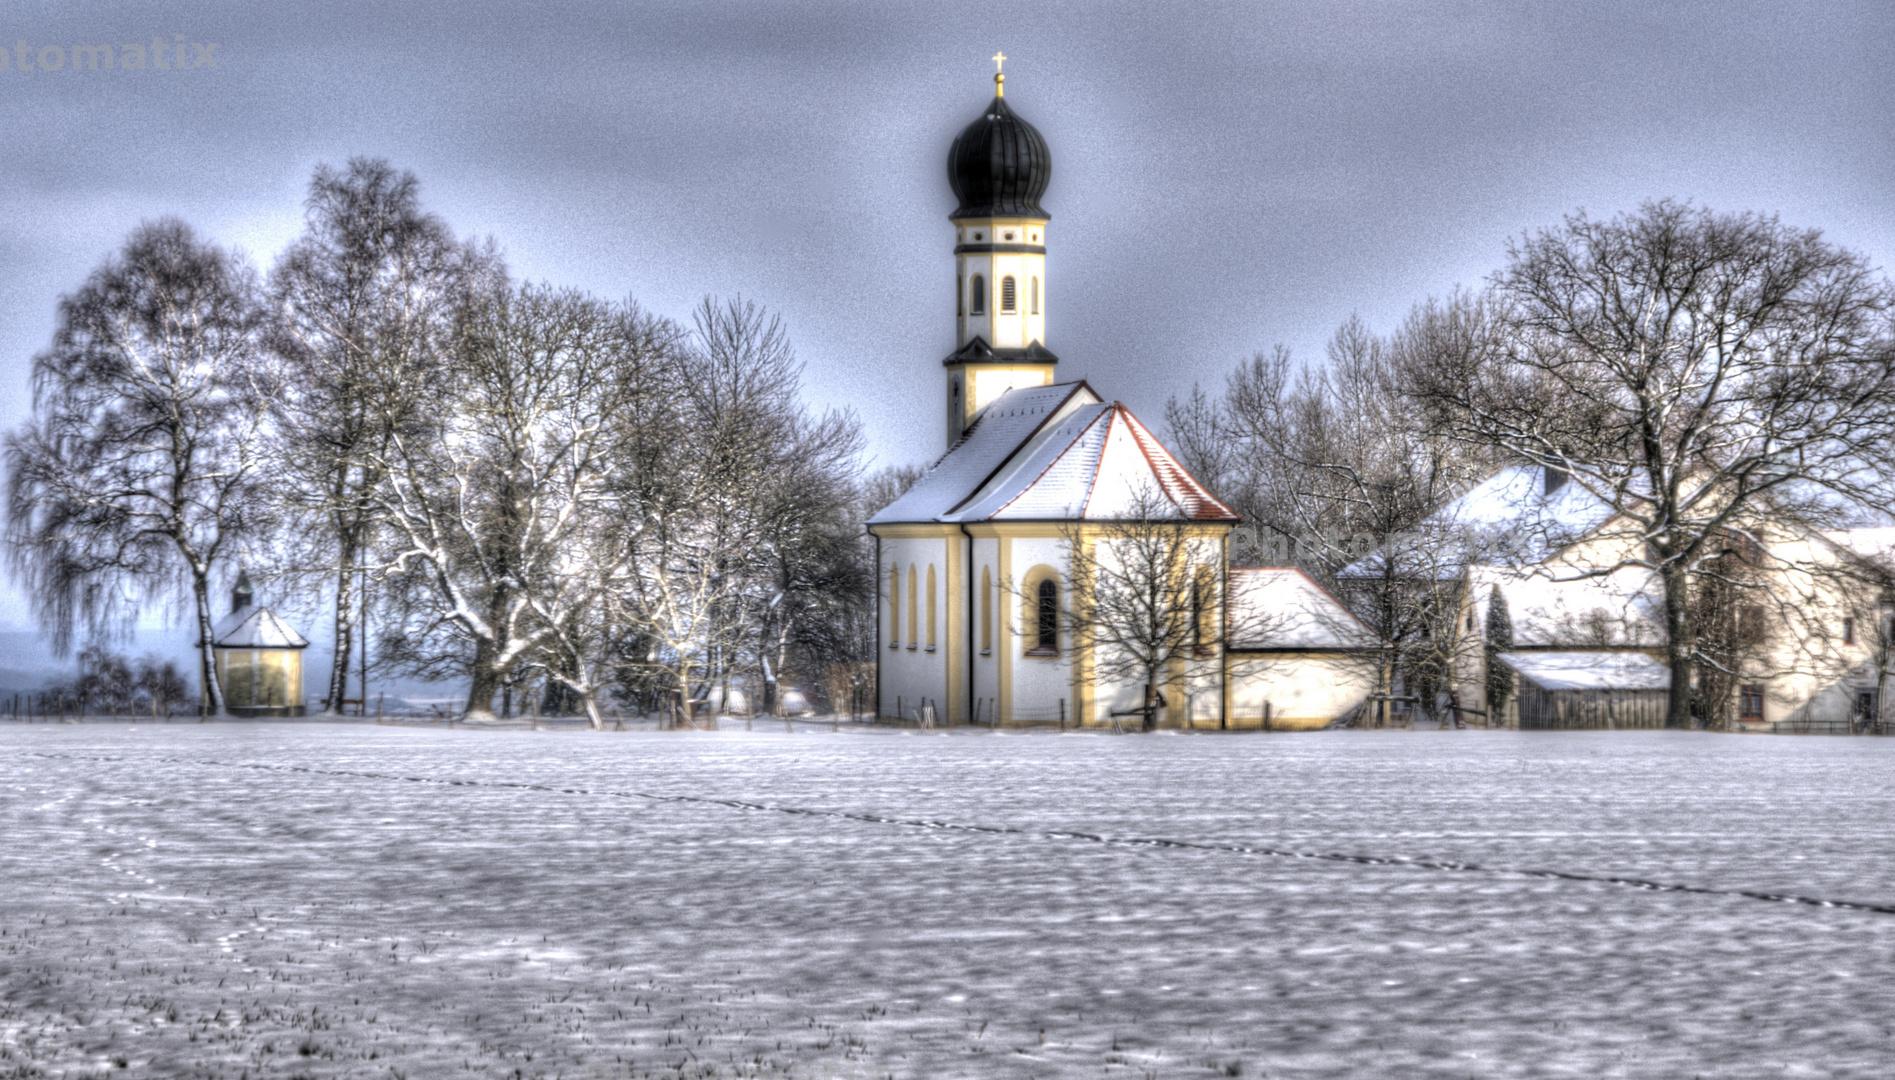 winterberg bei aschau am inn foto bild jahreszeiten winter winter schnee kapelle kirche. Black Bedroom Furniture Sets. Home Design Ideas